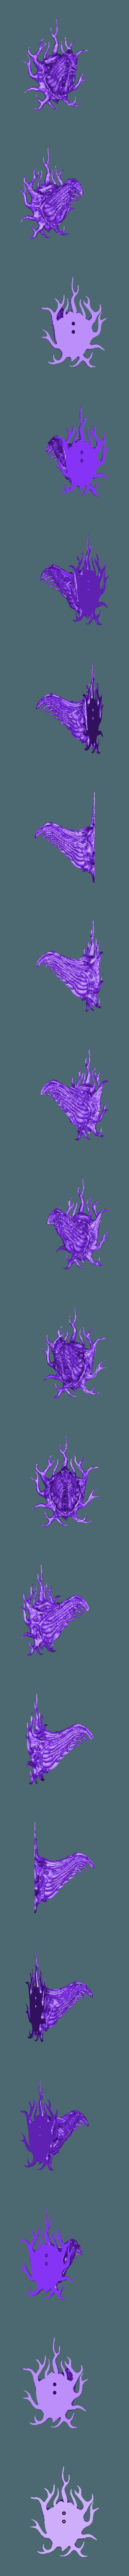 "Tentacular01_LOW_repaired_normals.stl Download free STL file Tabletop plant: ""Tentacular"" (Alien Vegetation 19) • 3D printer model, GrimGreeble"